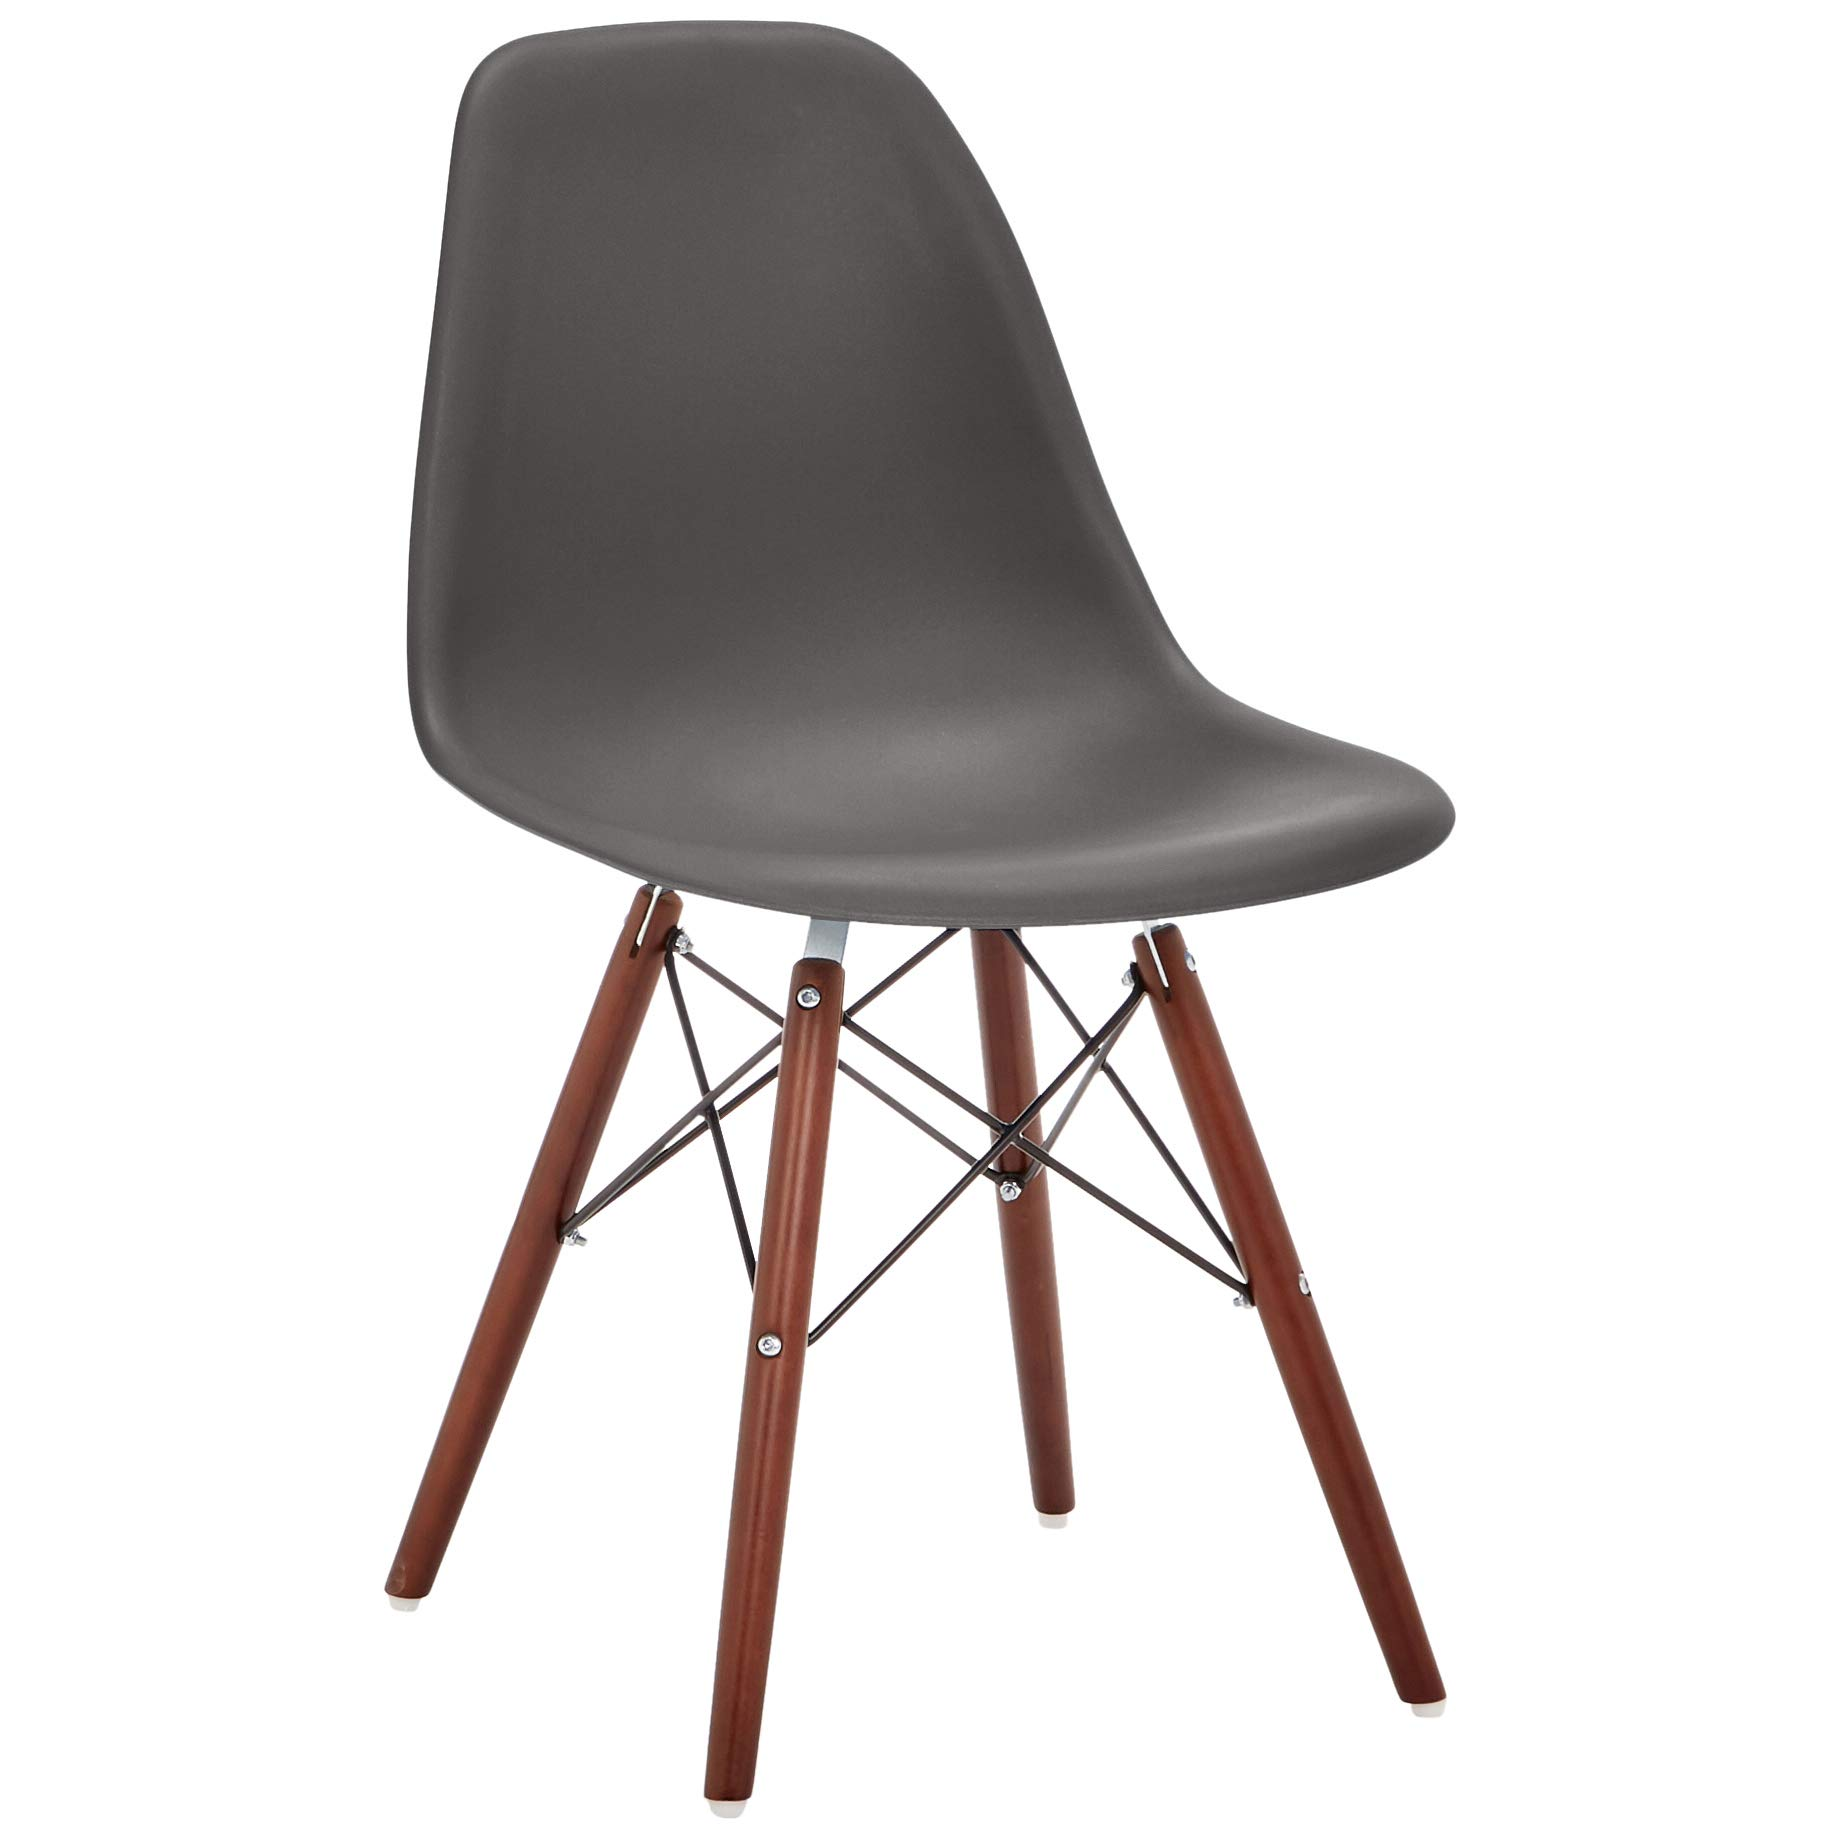 Phoenix Home AVH072003 Dining Chair, 21'' Length x 18.5'' Width x 32.5'' Height, Gray